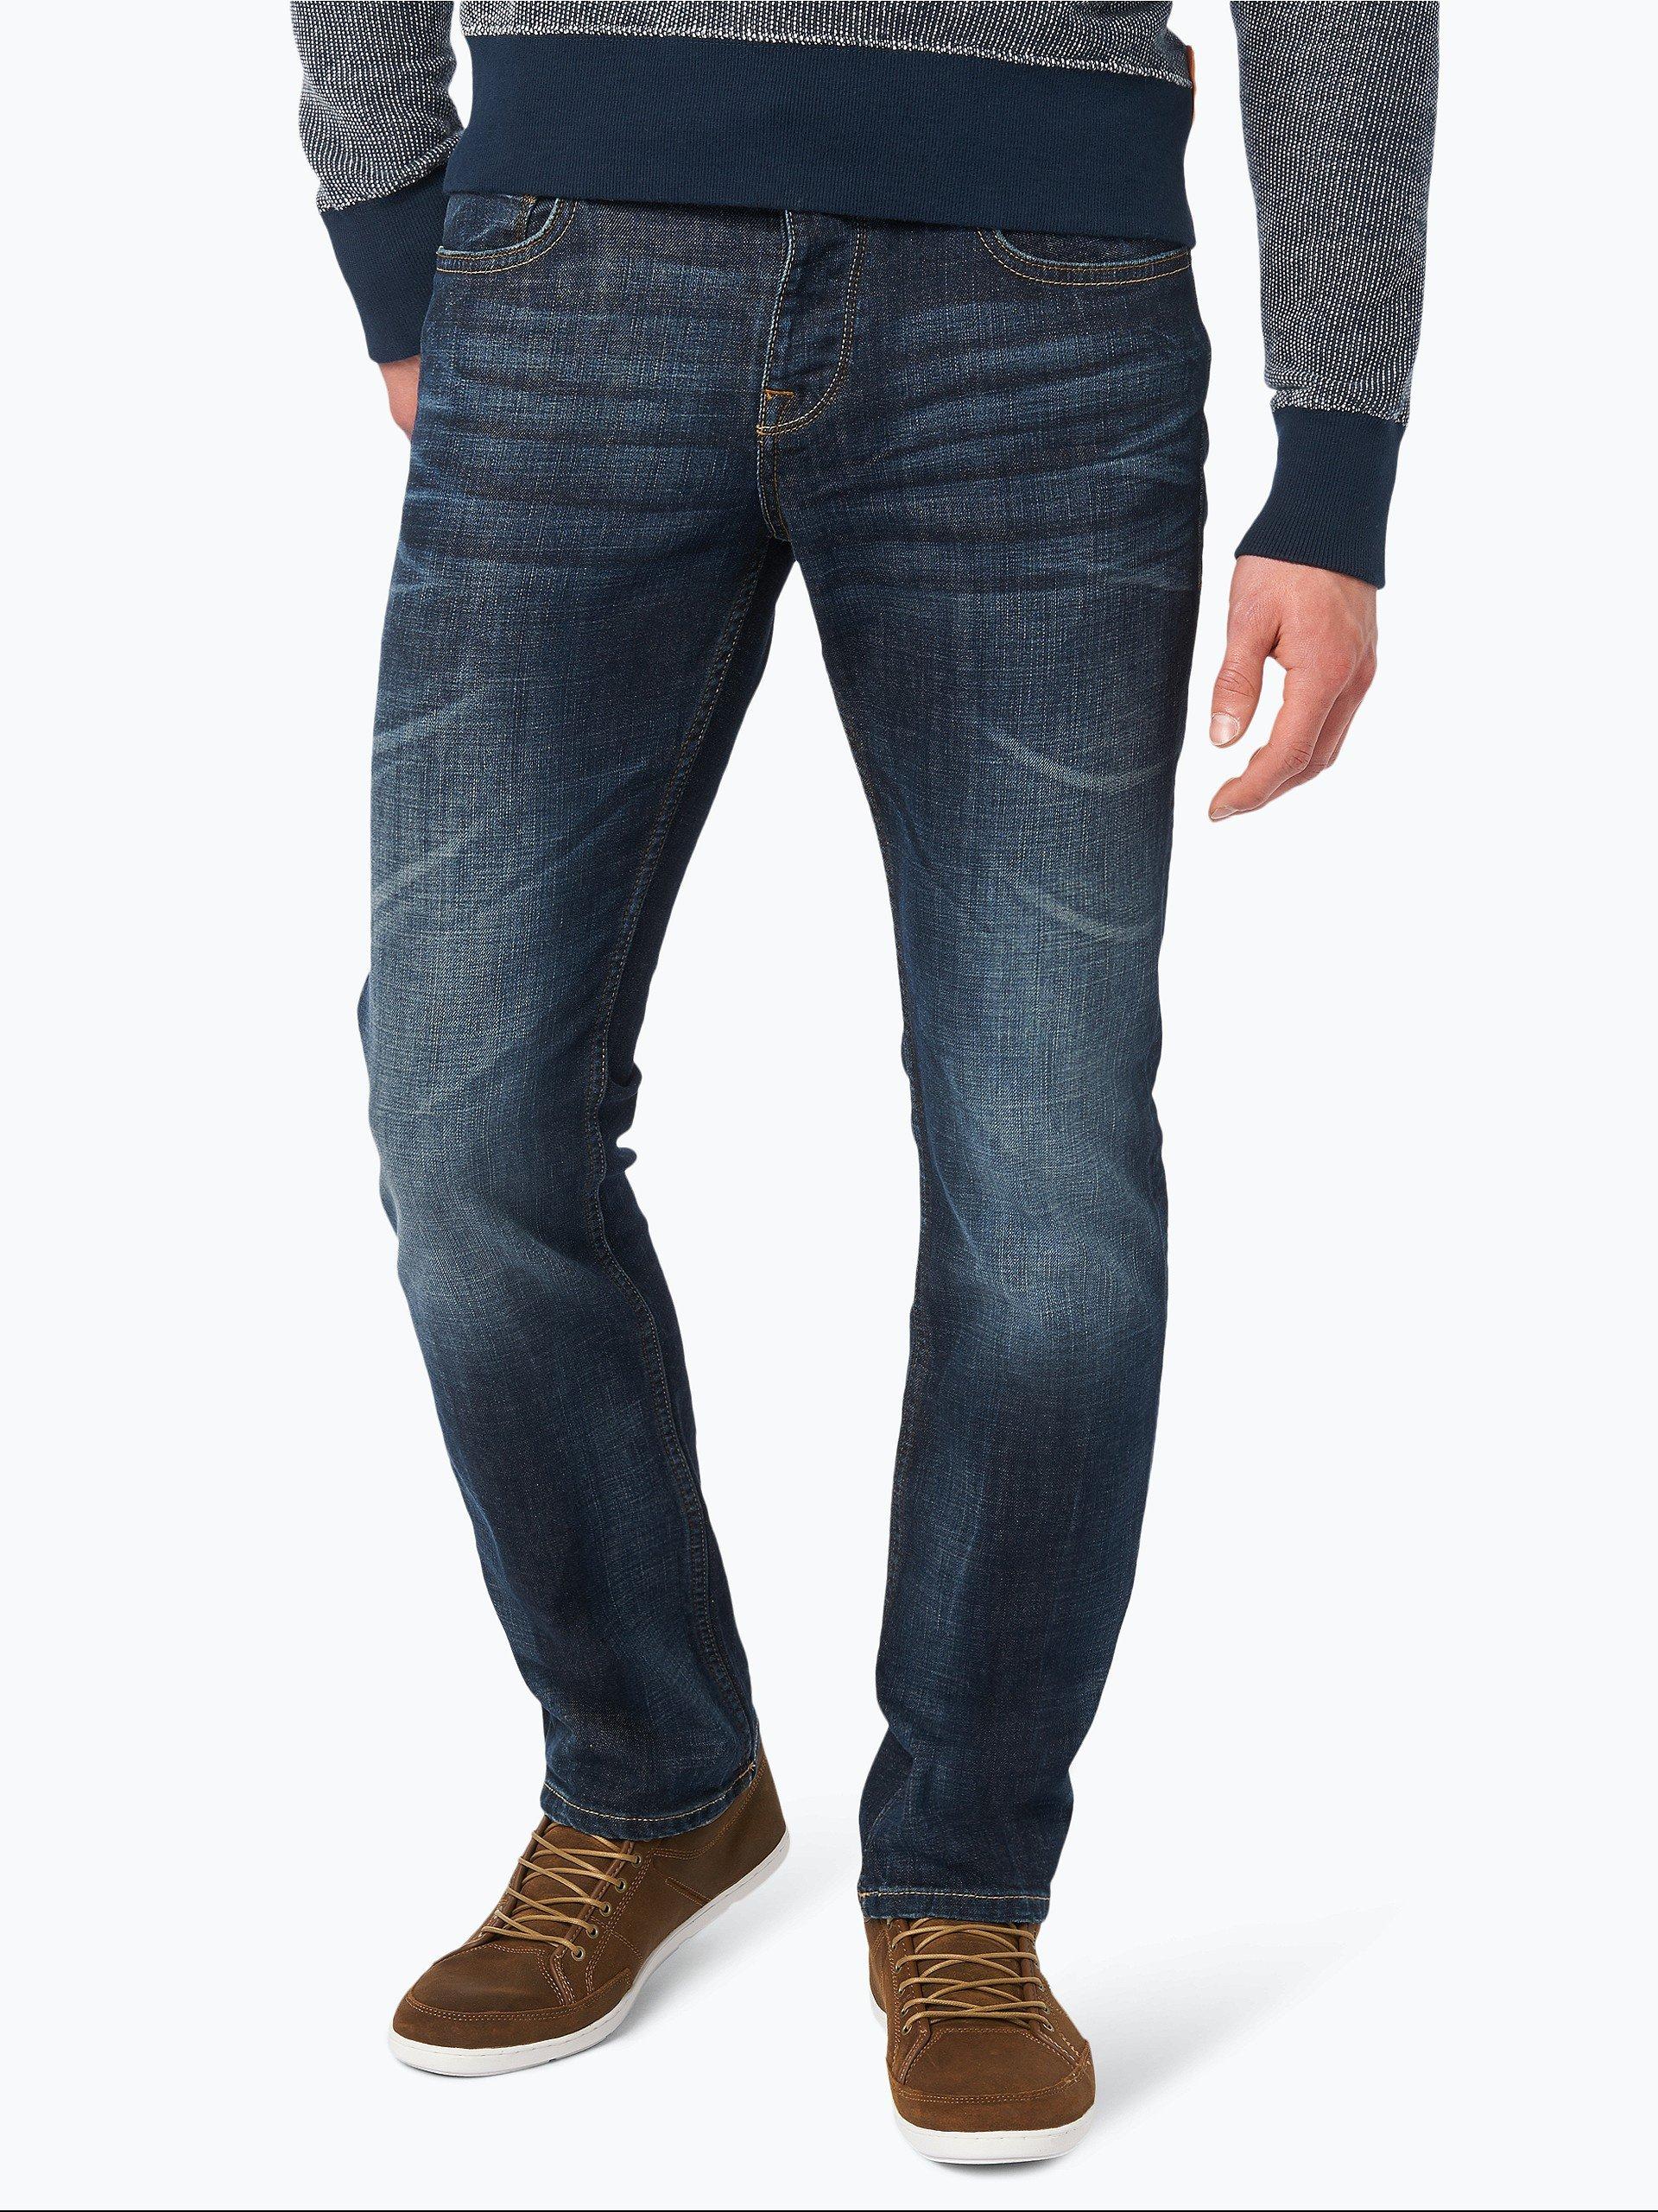 boss casual herren jeans orange 25 indigo uni online kaufen peek und cloppenburg de. Black Bedroom Furniture Sets. Home Design Ideas